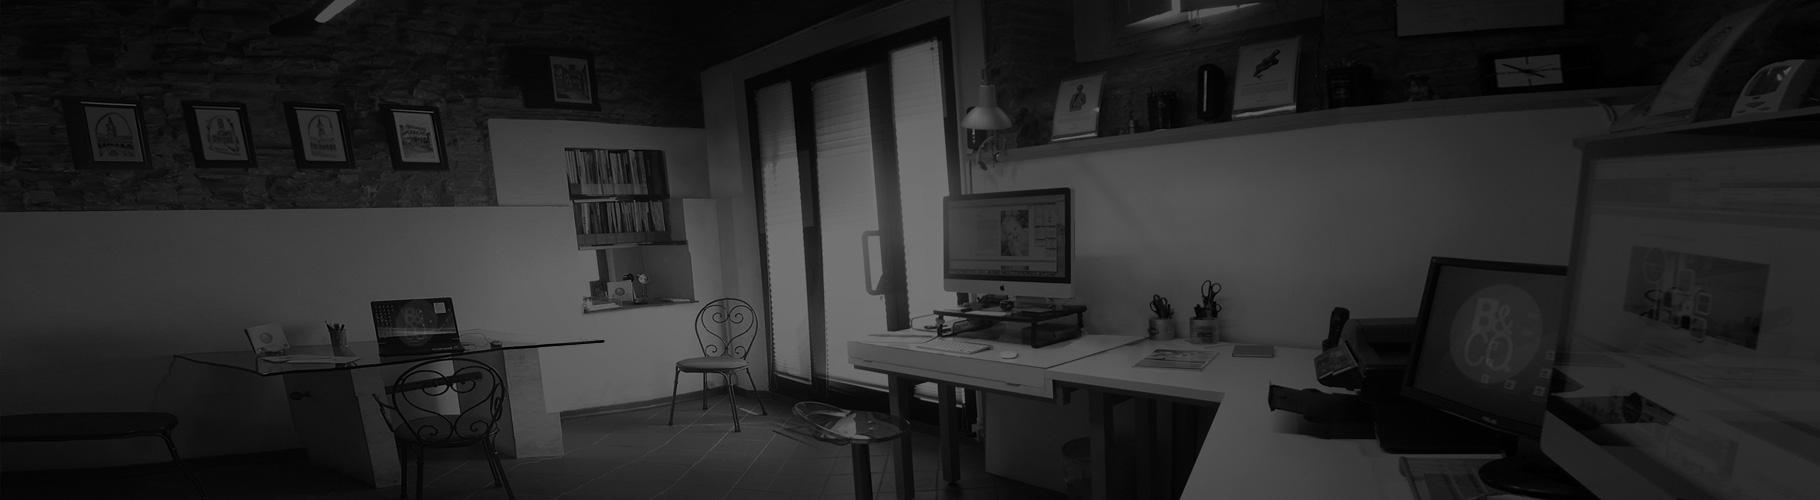 studio-grafico-biagini3